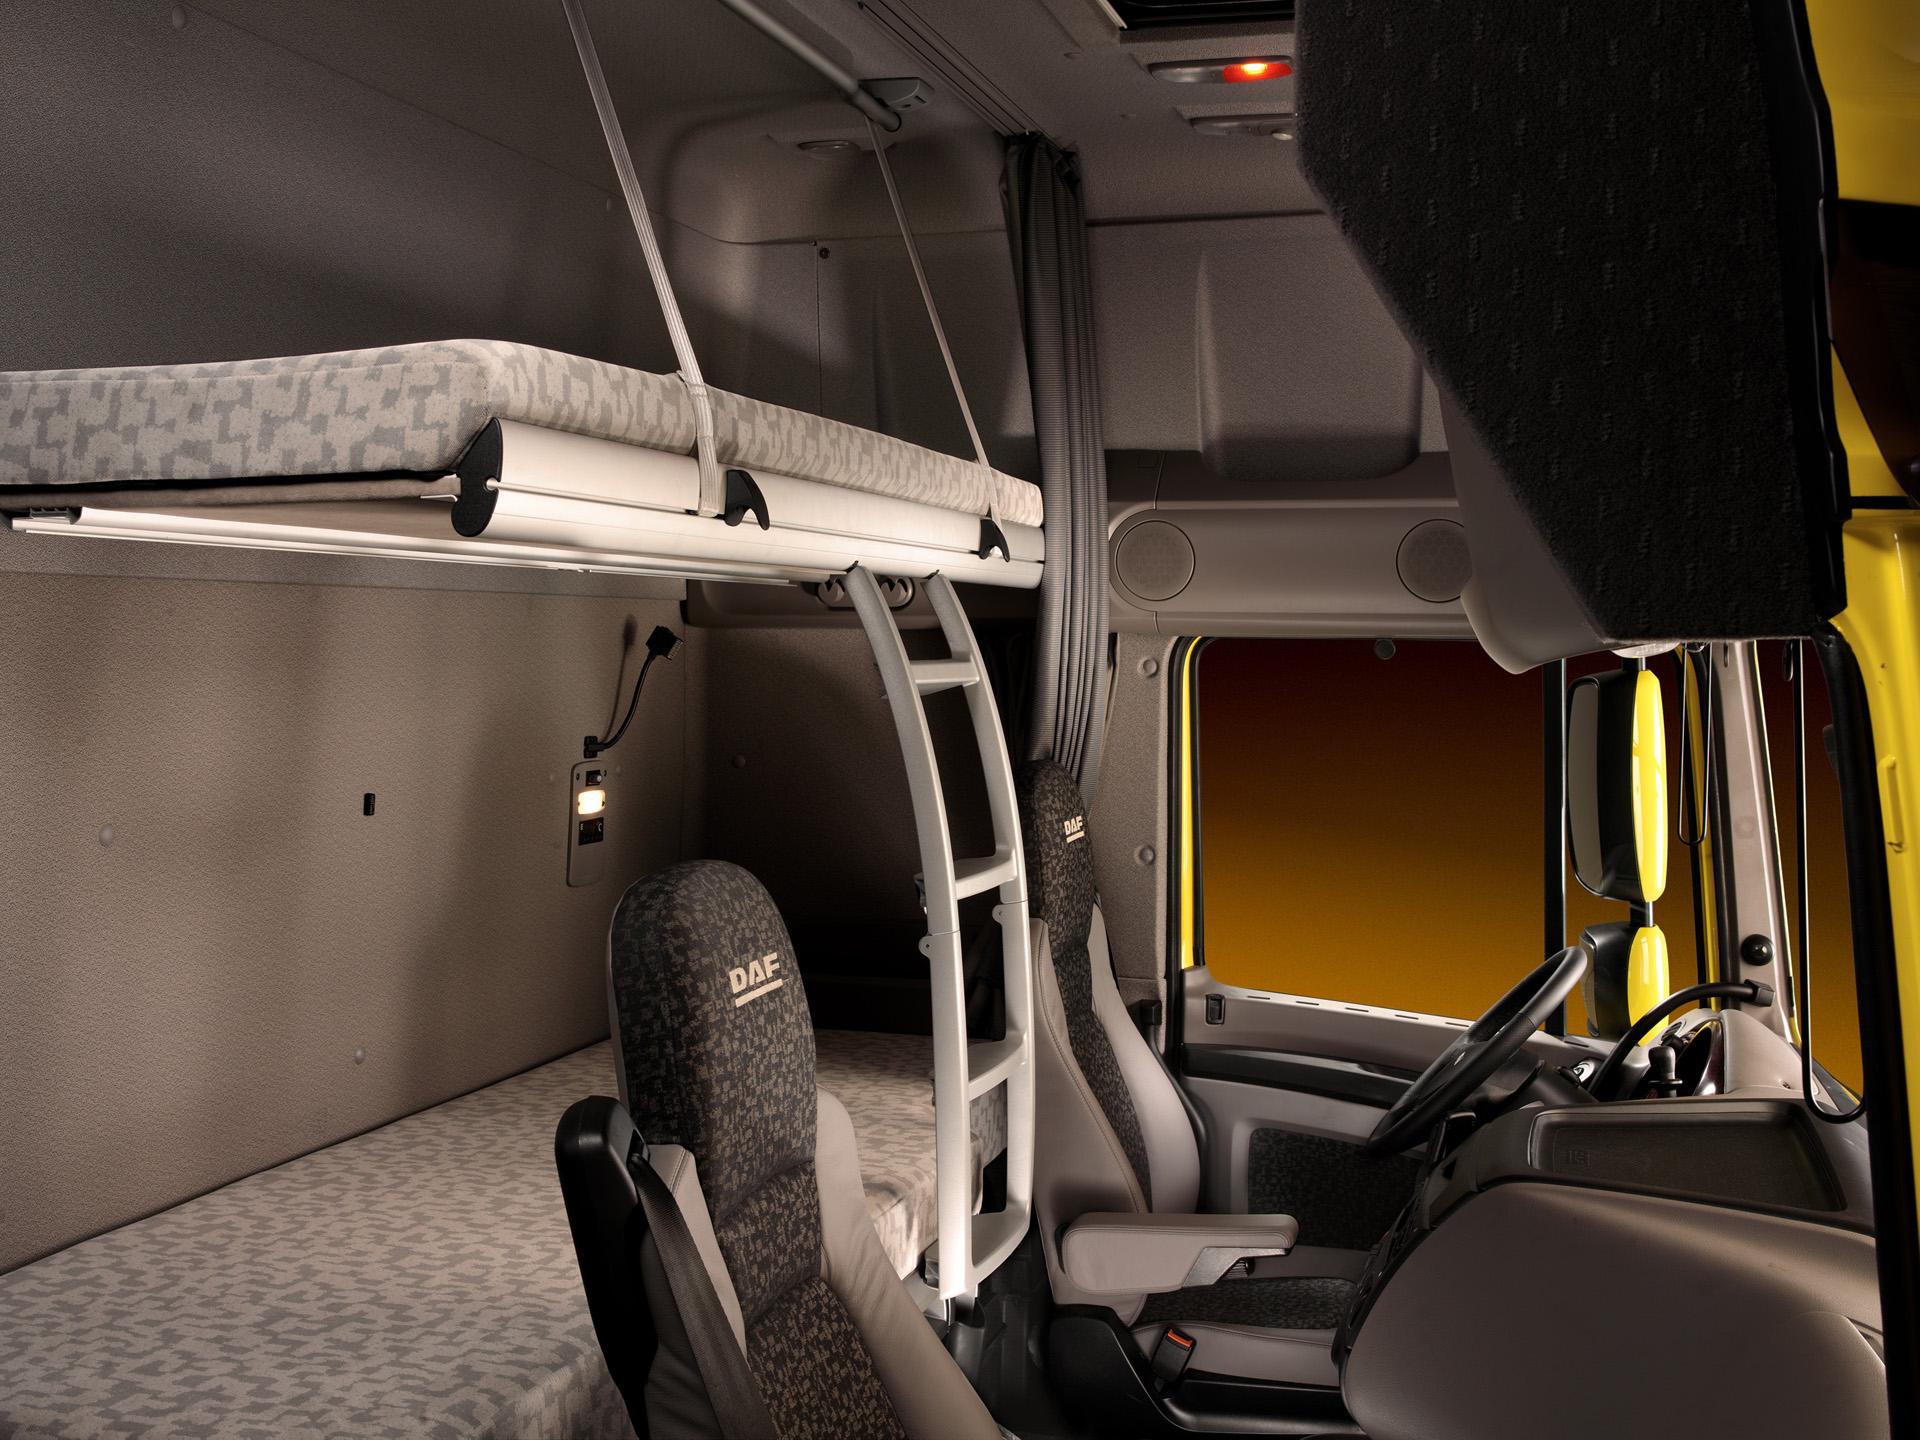 daf xf super space cab interior On daf super space cab interior